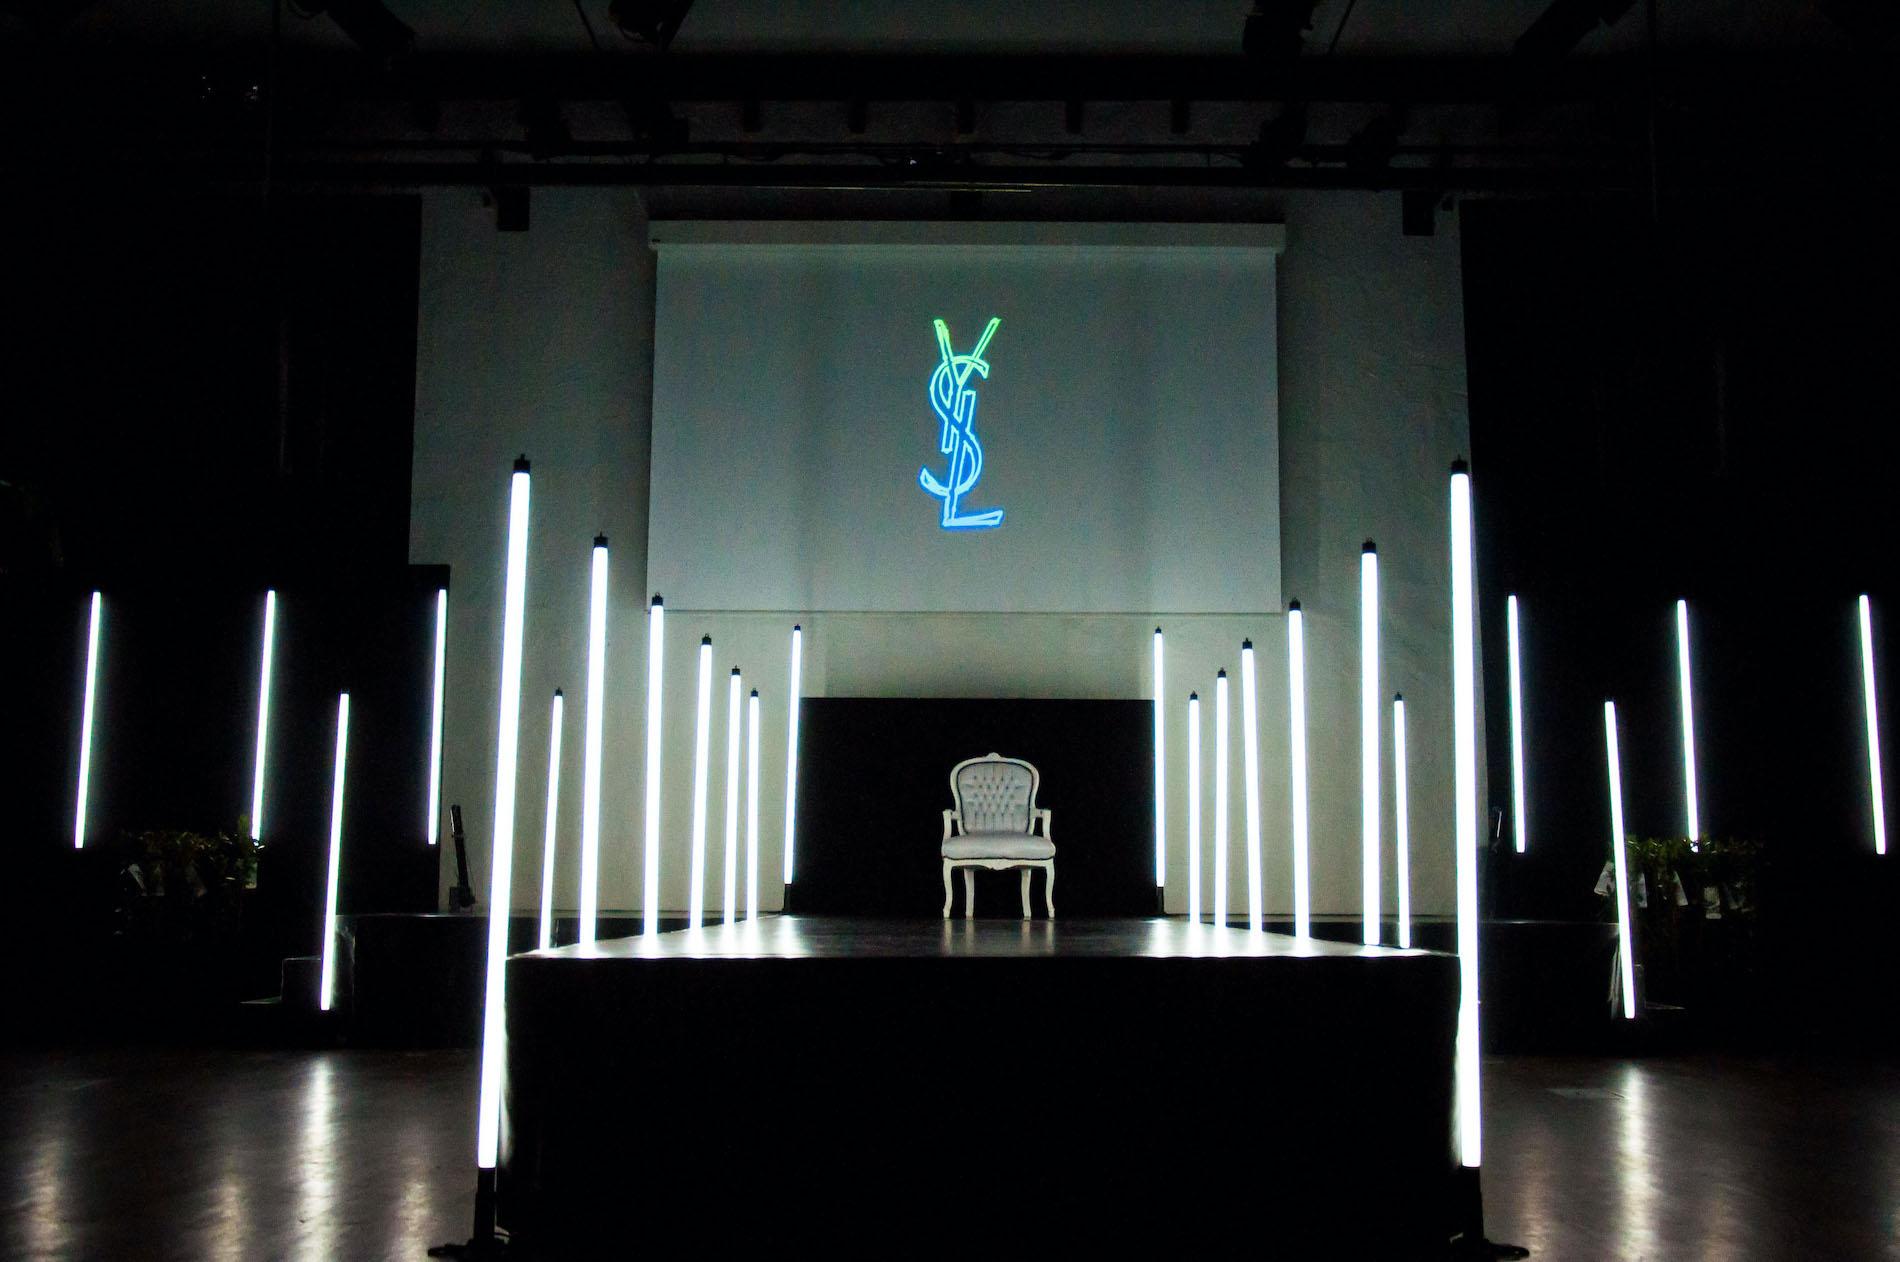 Yves Saint Laurent event